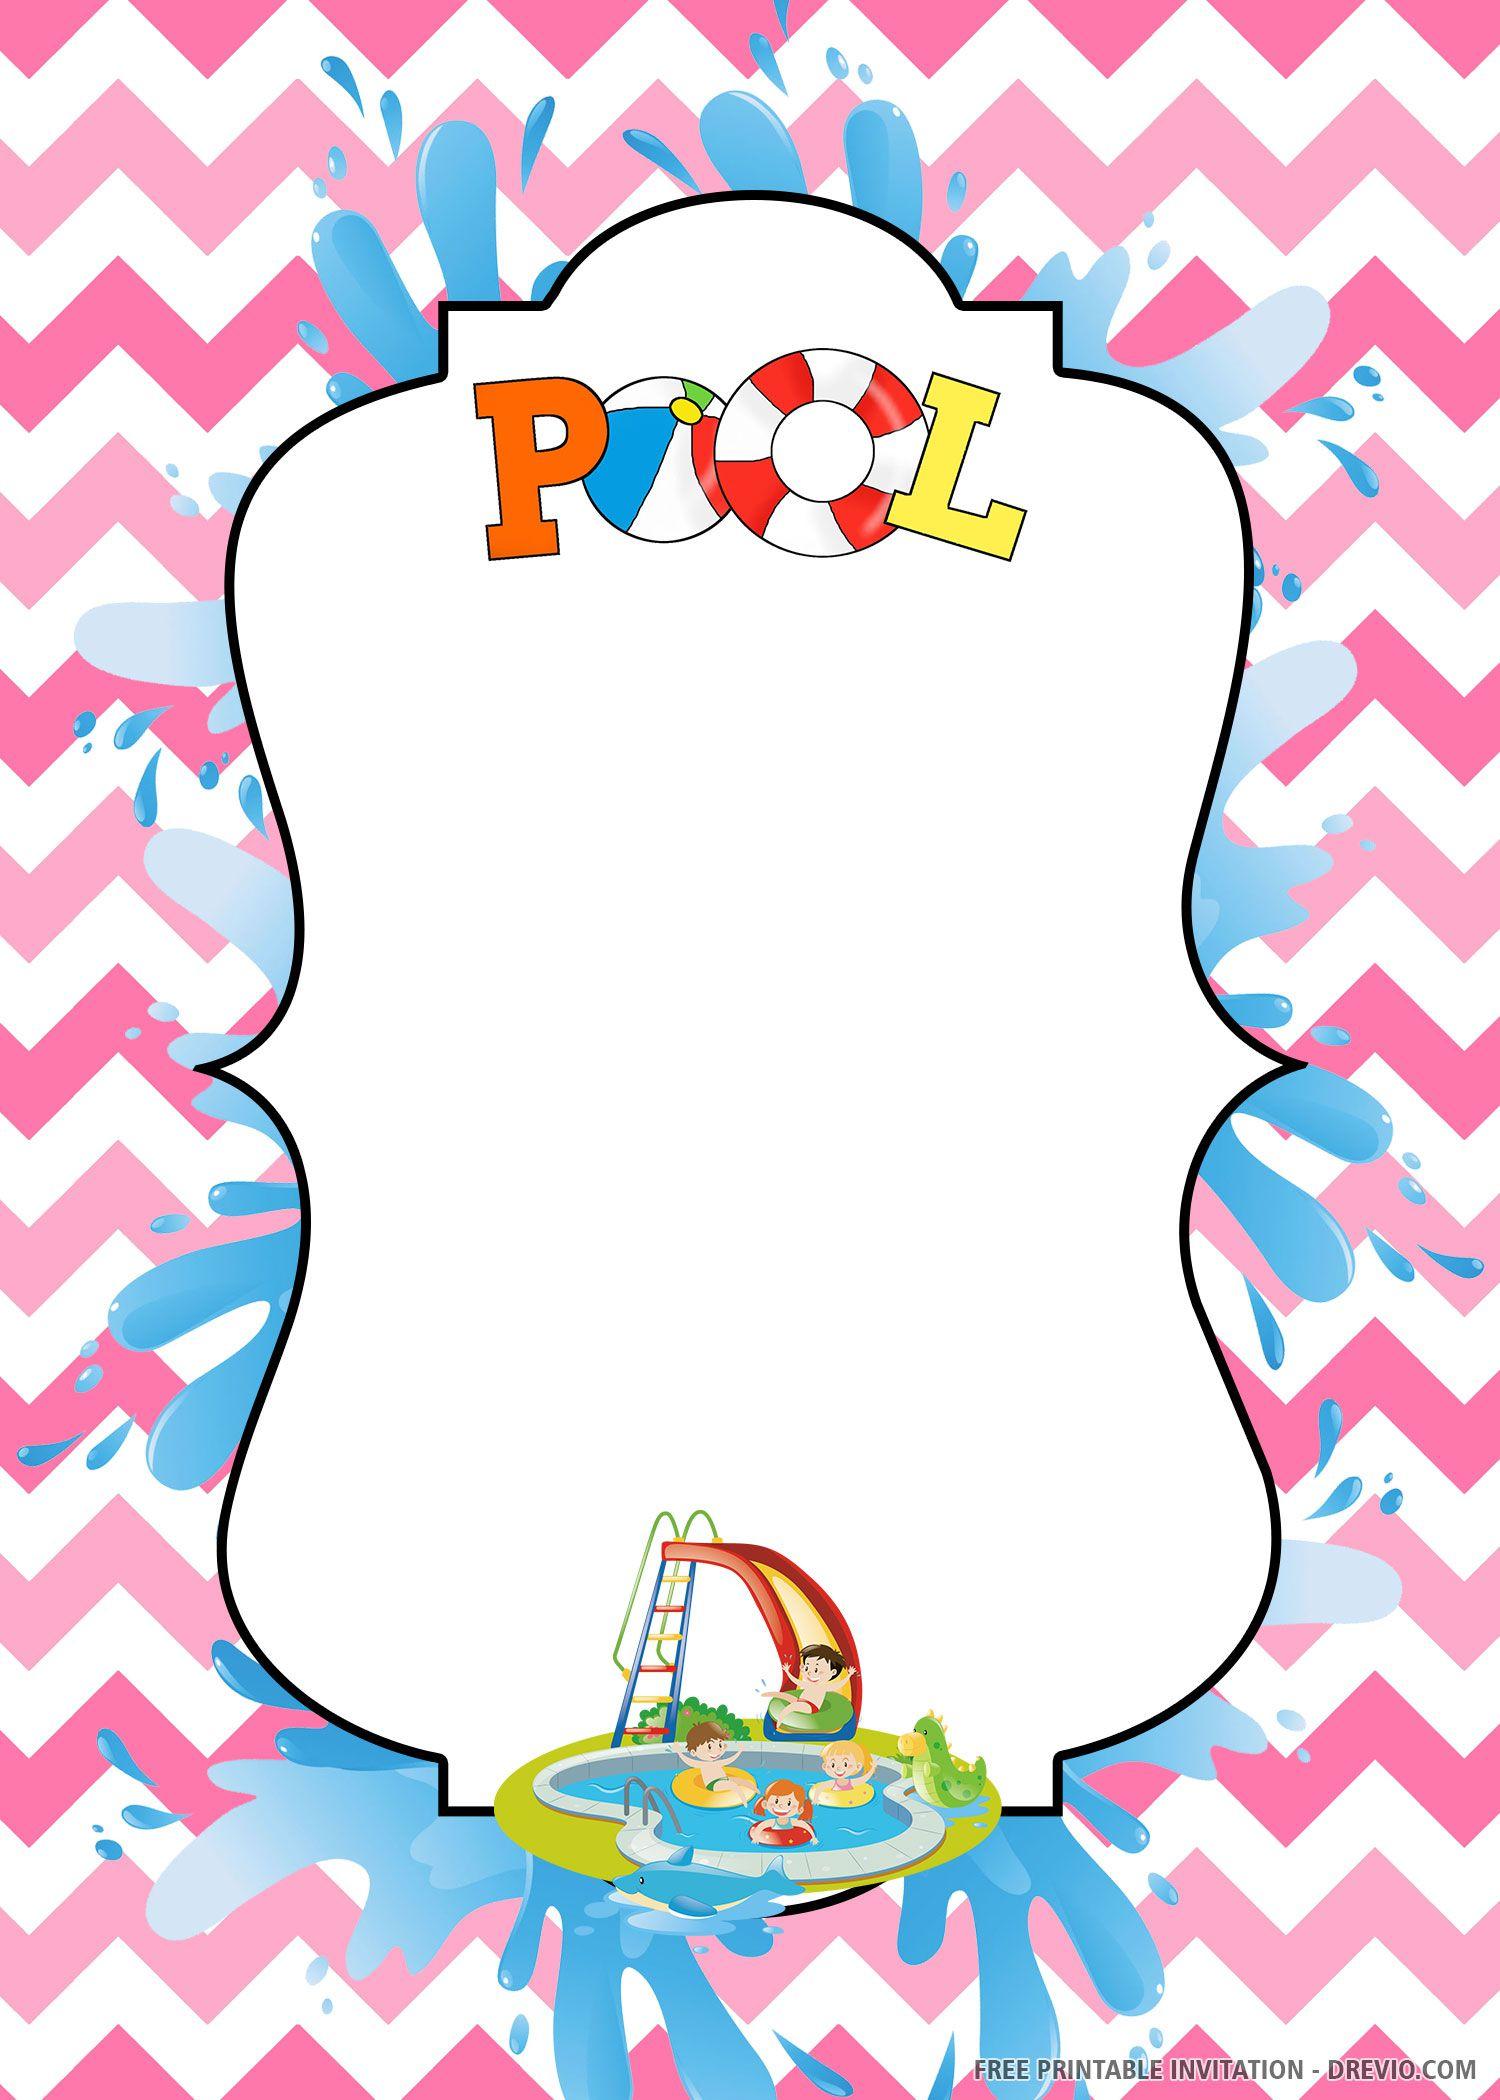 005 Stupendou Free Pool Party Invitation Template Printable Image  Card SummerFull